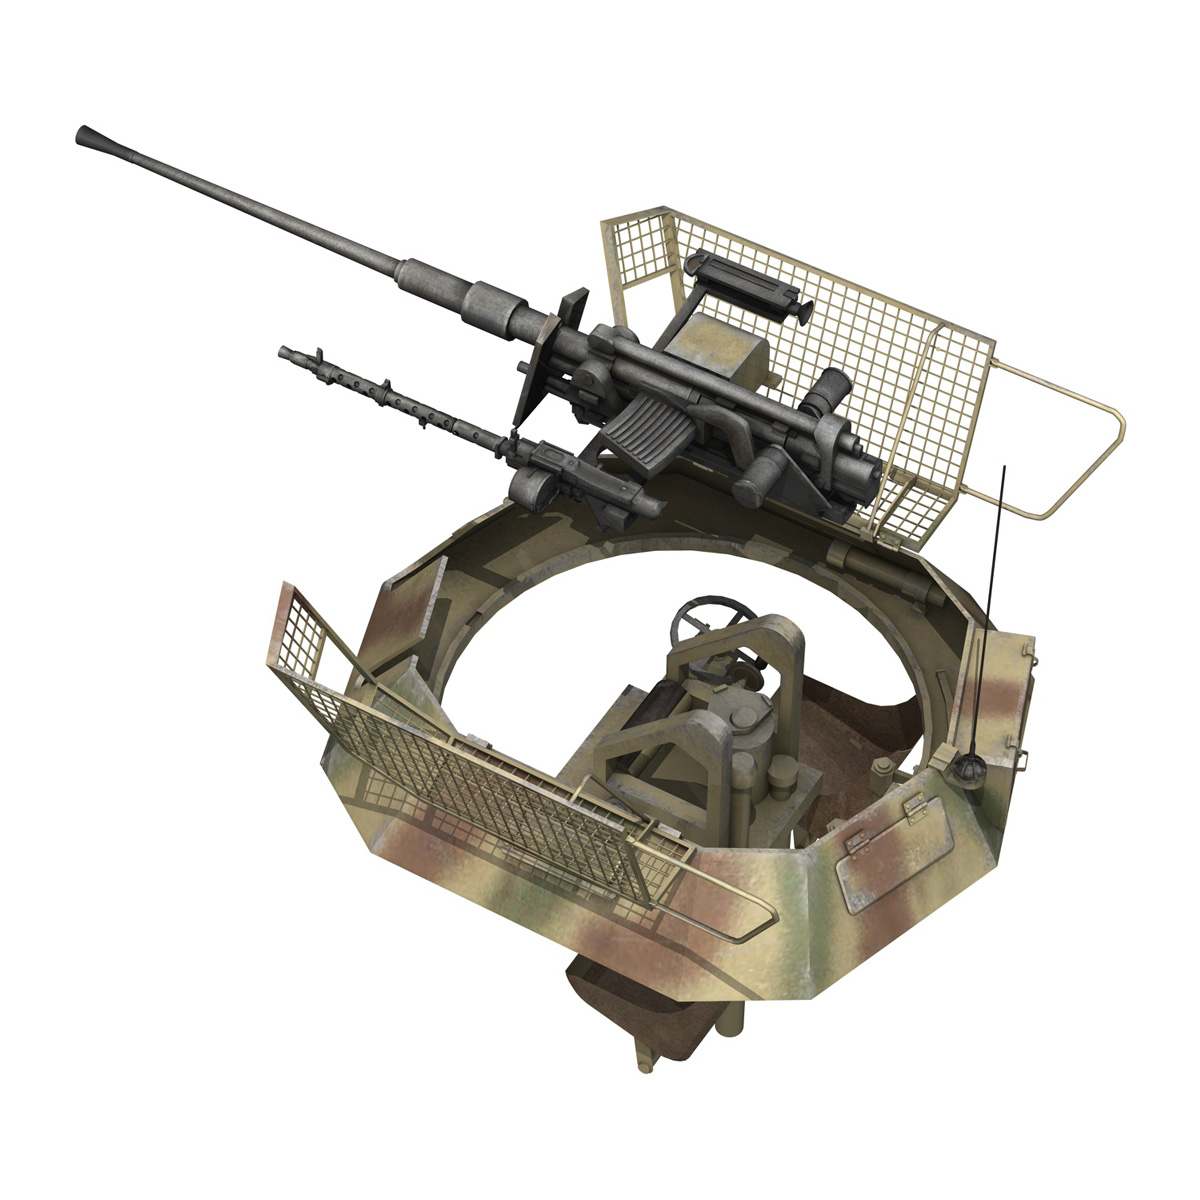 sd.kfz 250 9 – half-track armored vehicle 3d model 3ds fbx c4d lwo obj 198220